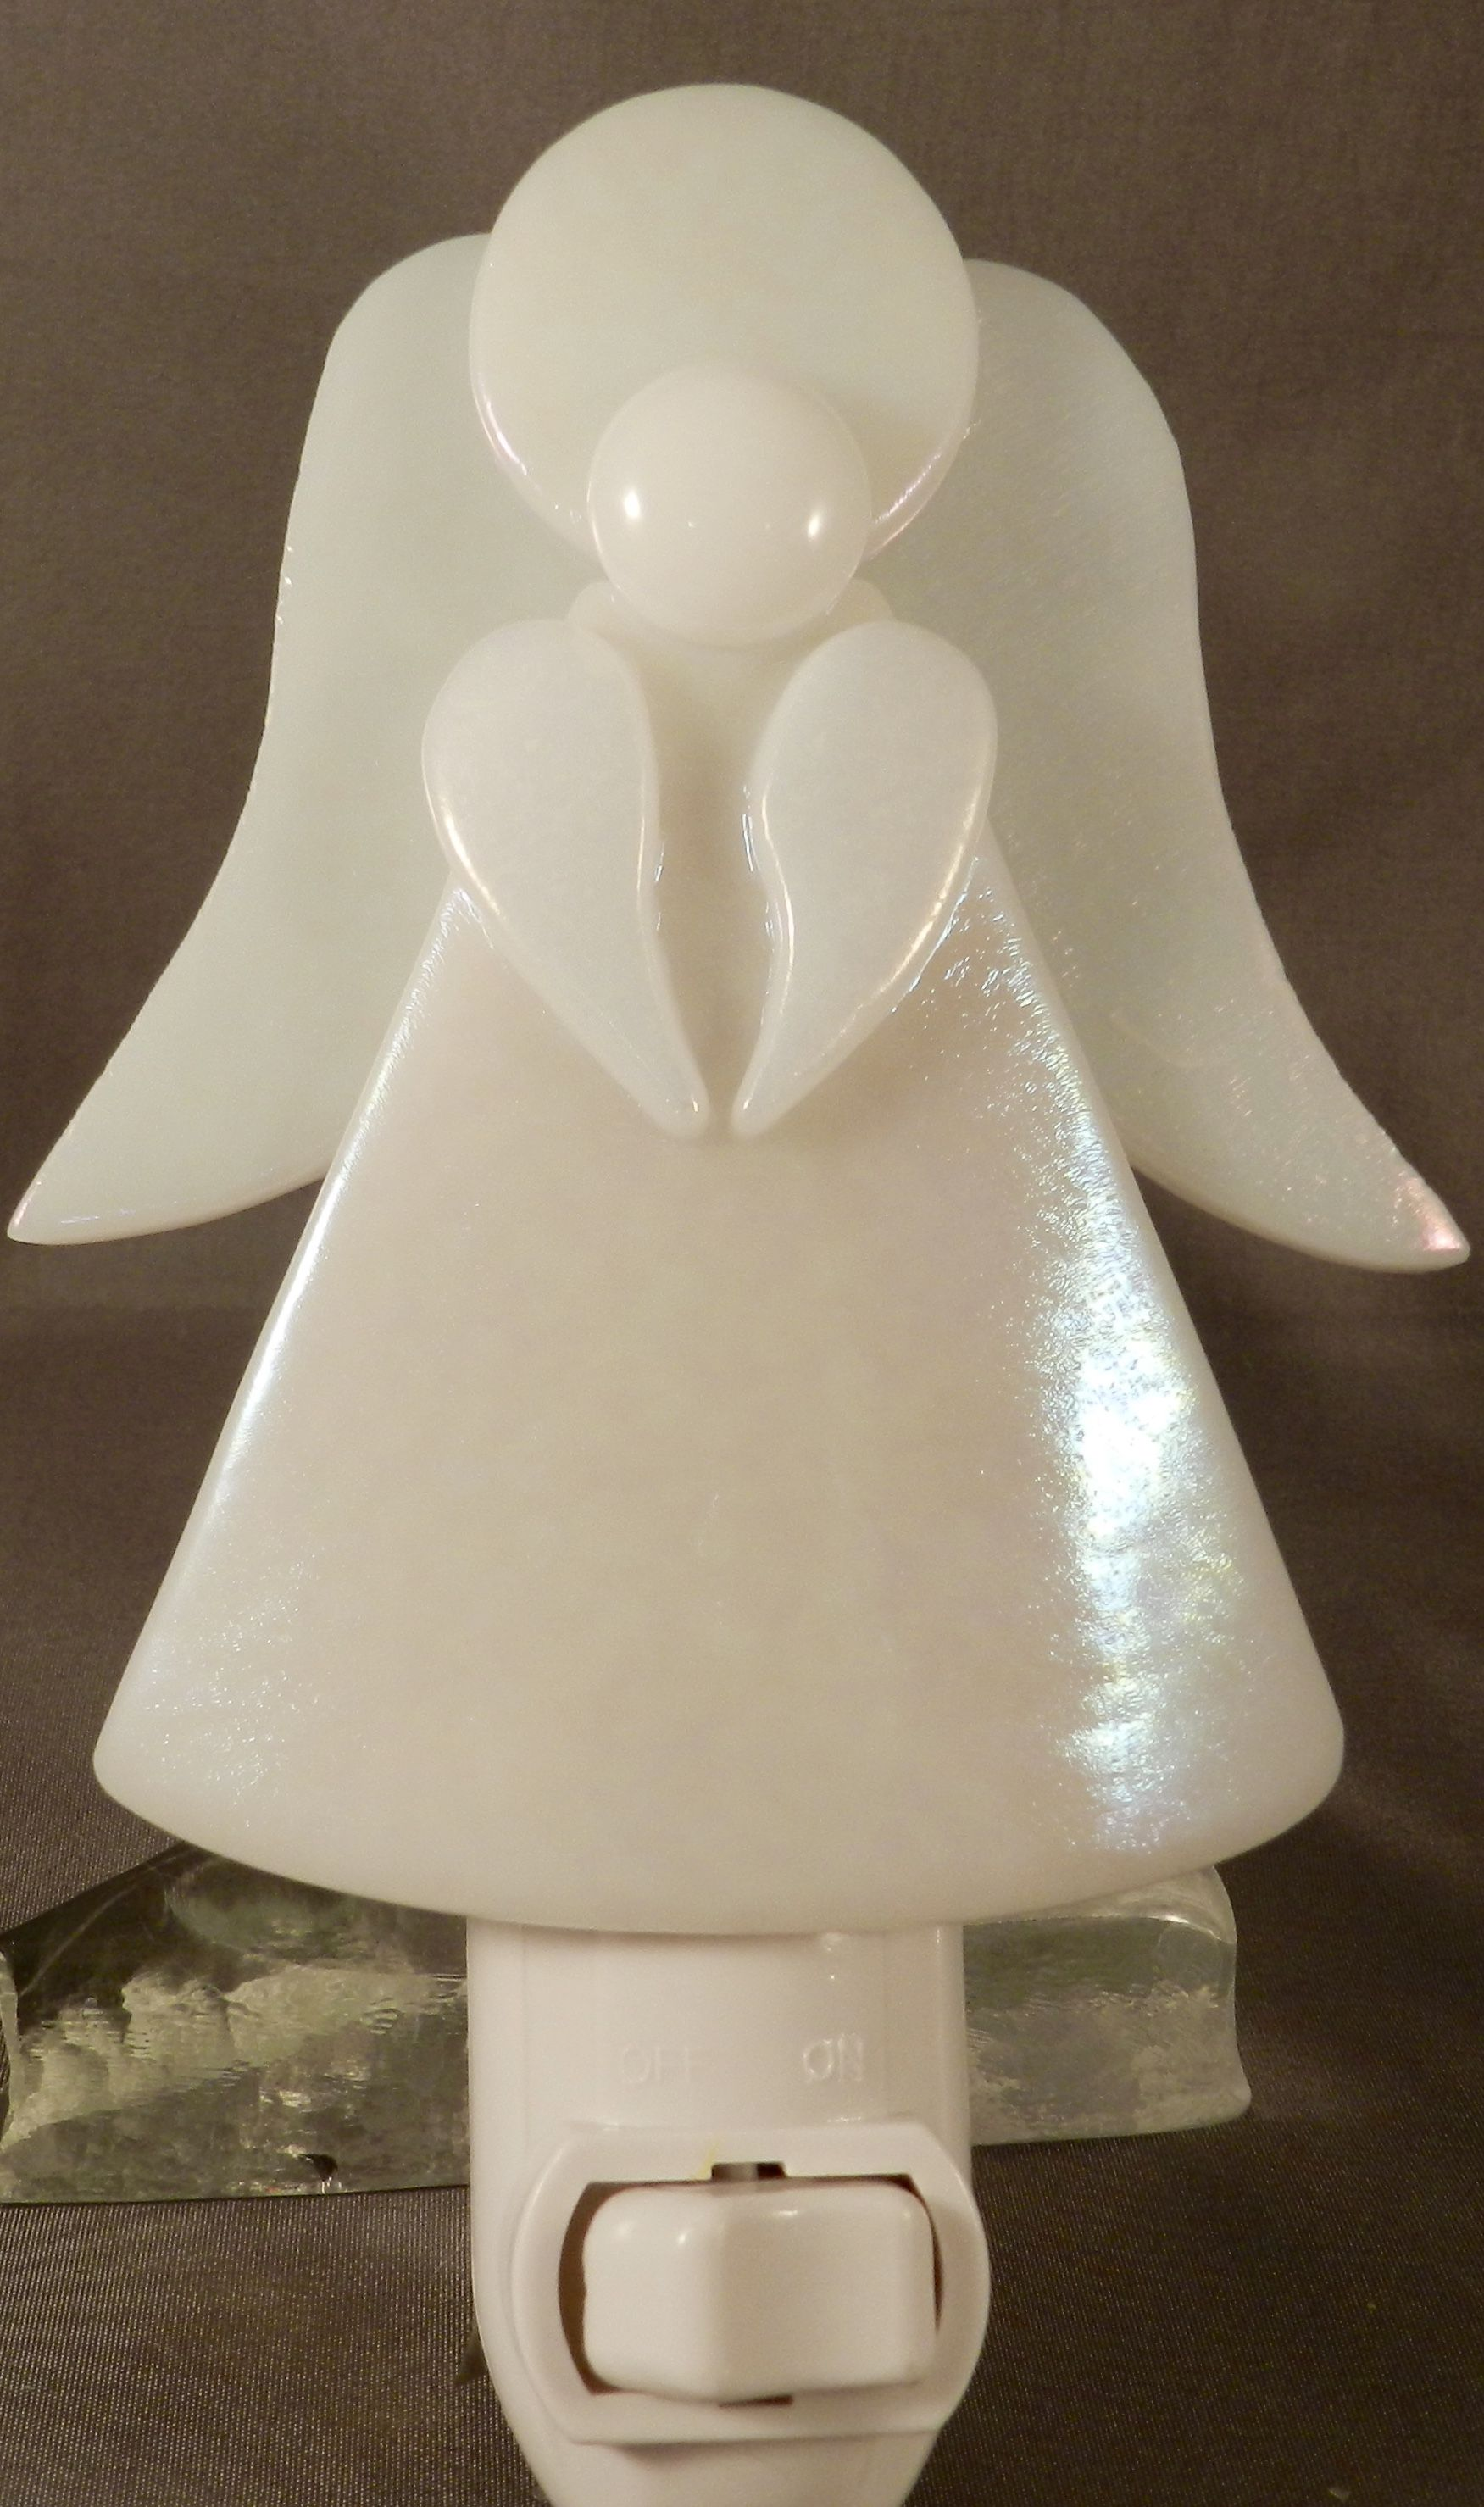 angel night light in white iridescent glass | Fused glass night ...